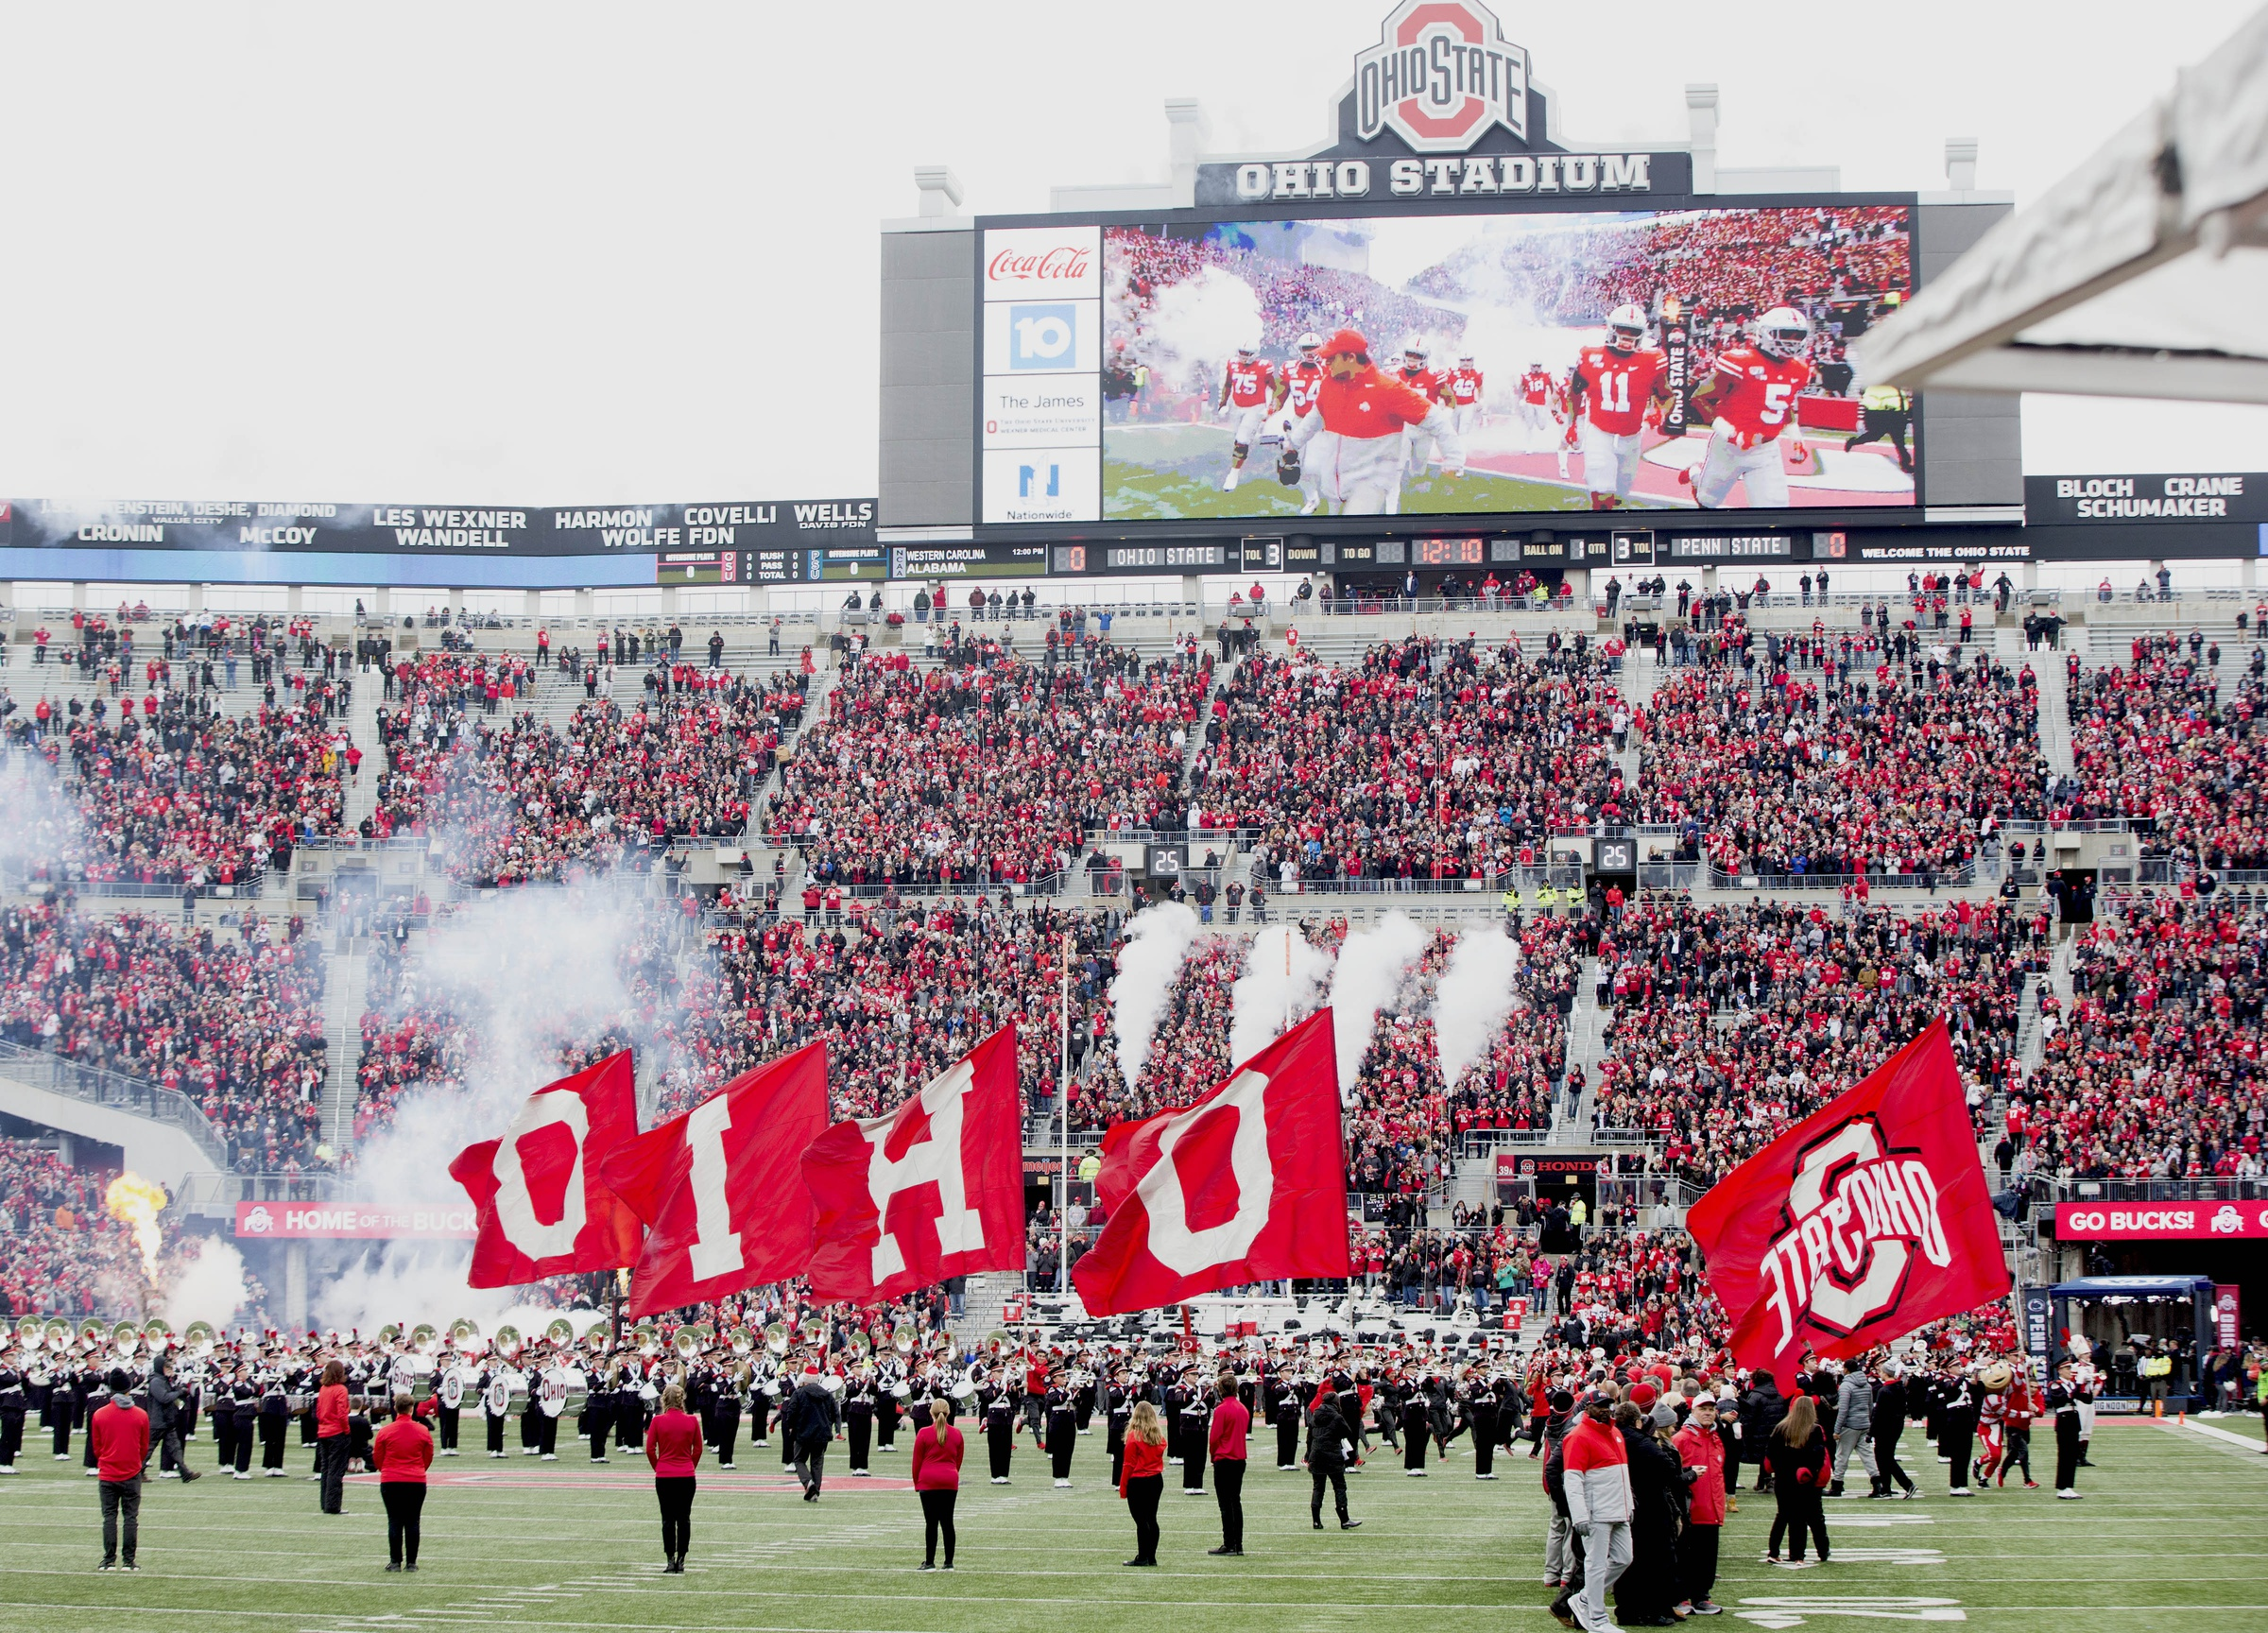 Ohio State-Ohio Stadium-Buckeyes-Ohio State football